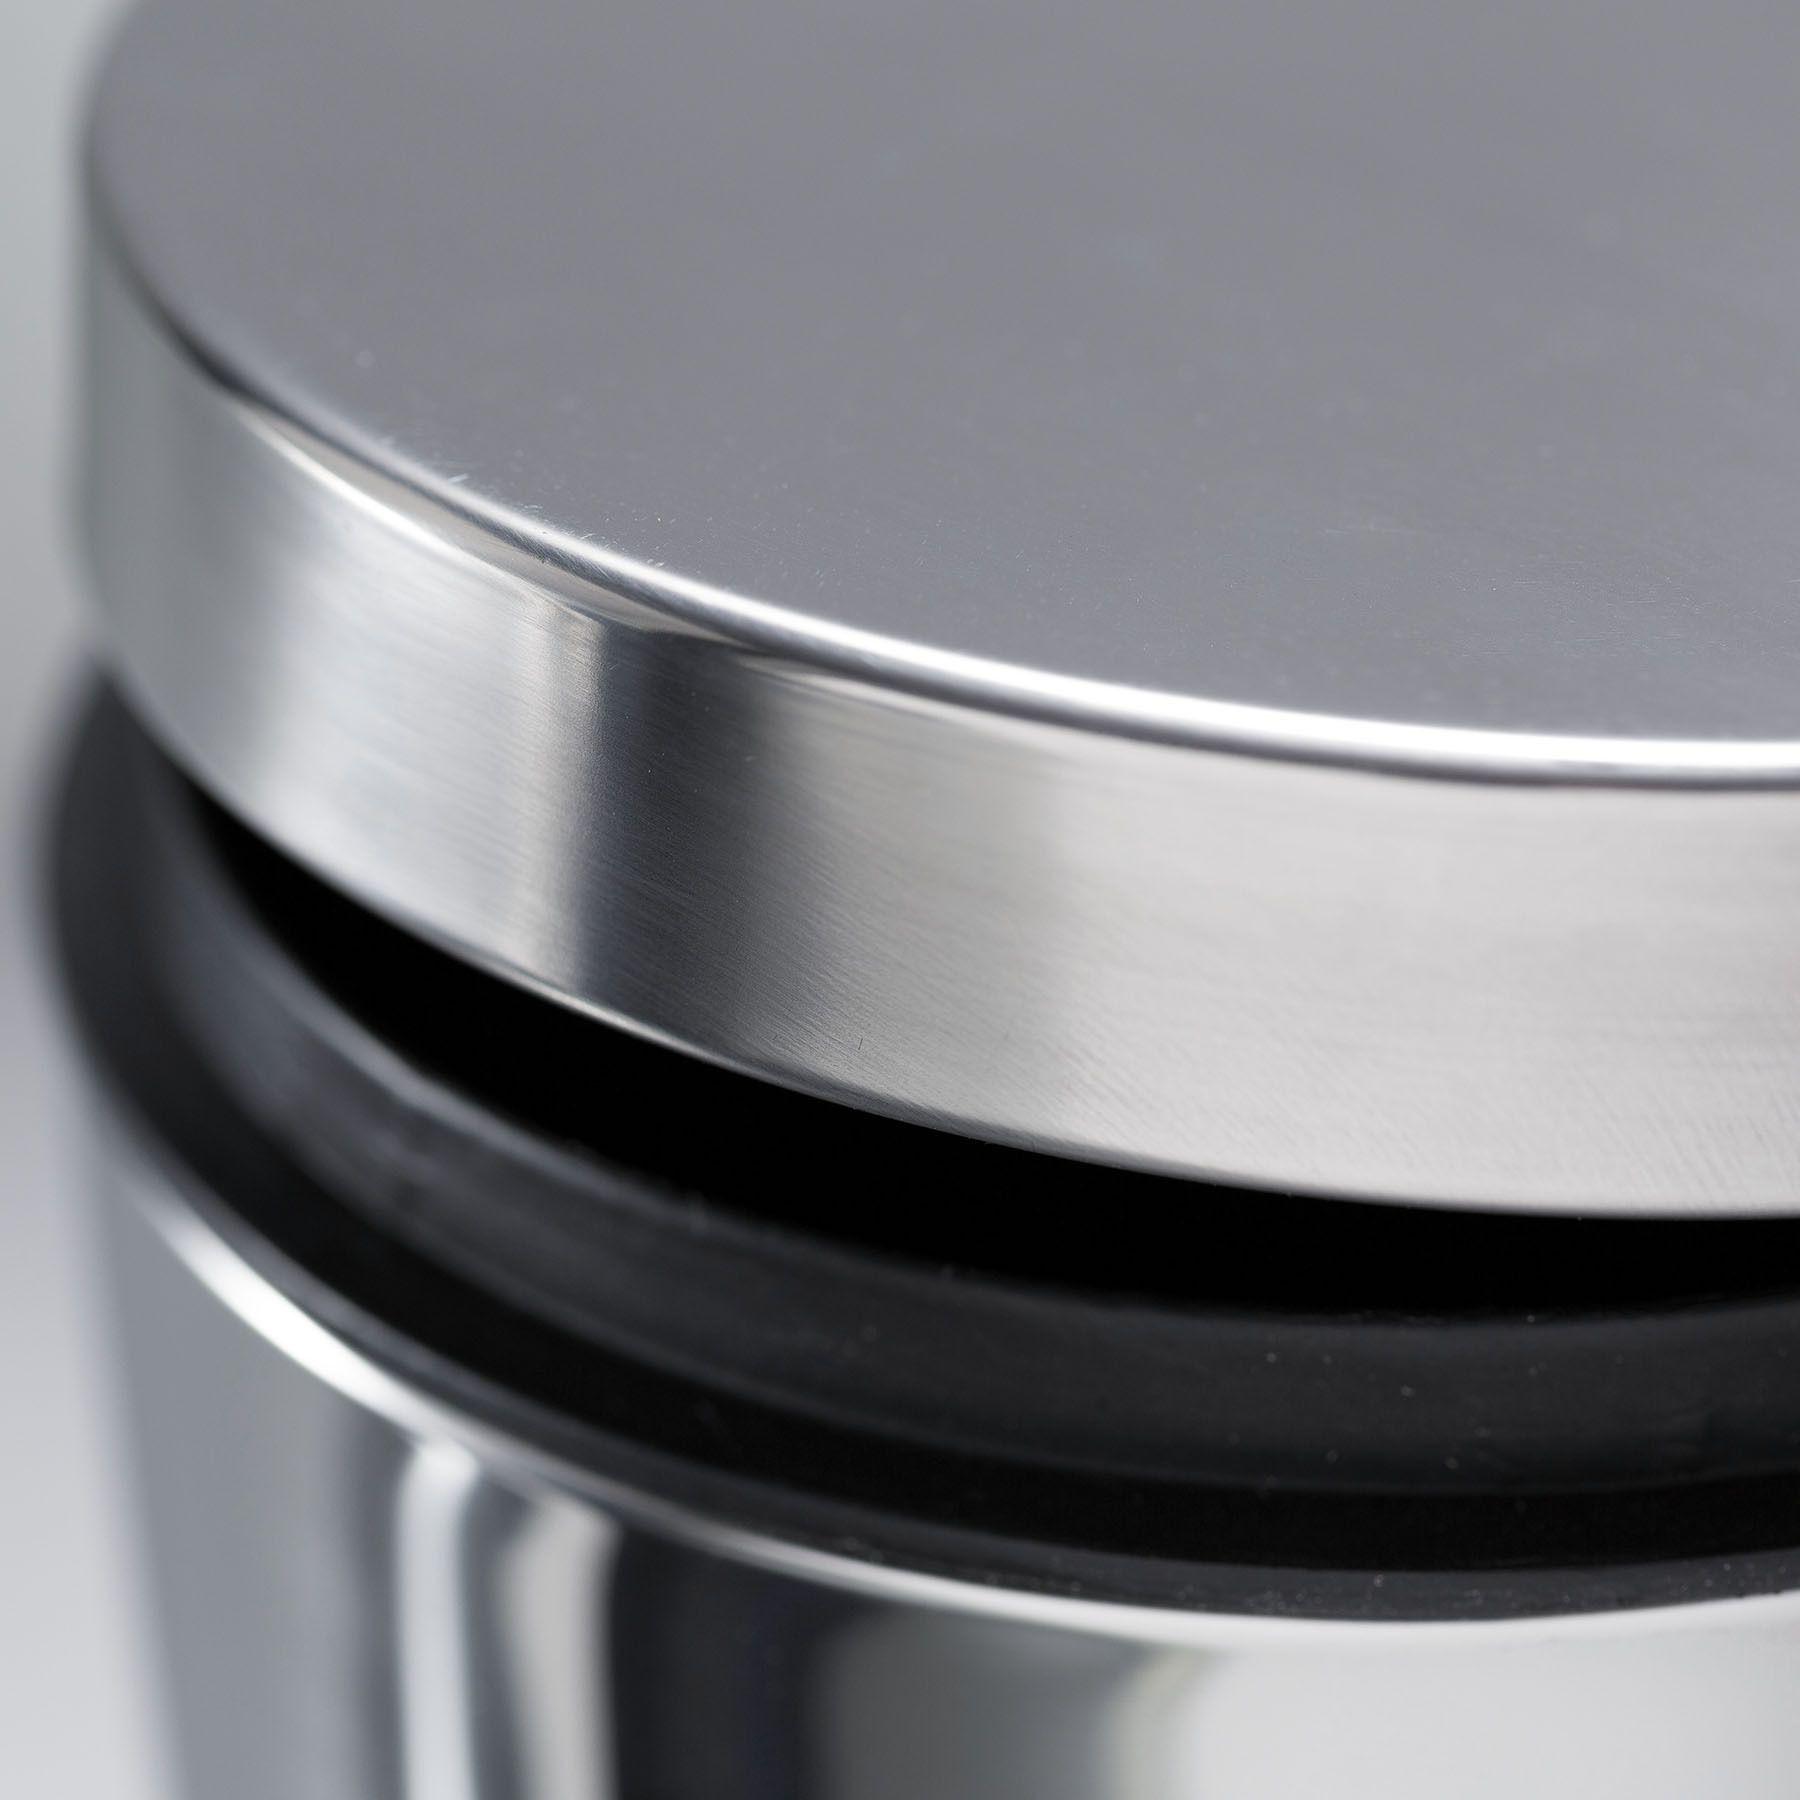 Pack 2 Unid. Lixeira Aço Inox 3 Litros com tampa e pedal cesto interno removivel - Dallare DL1324